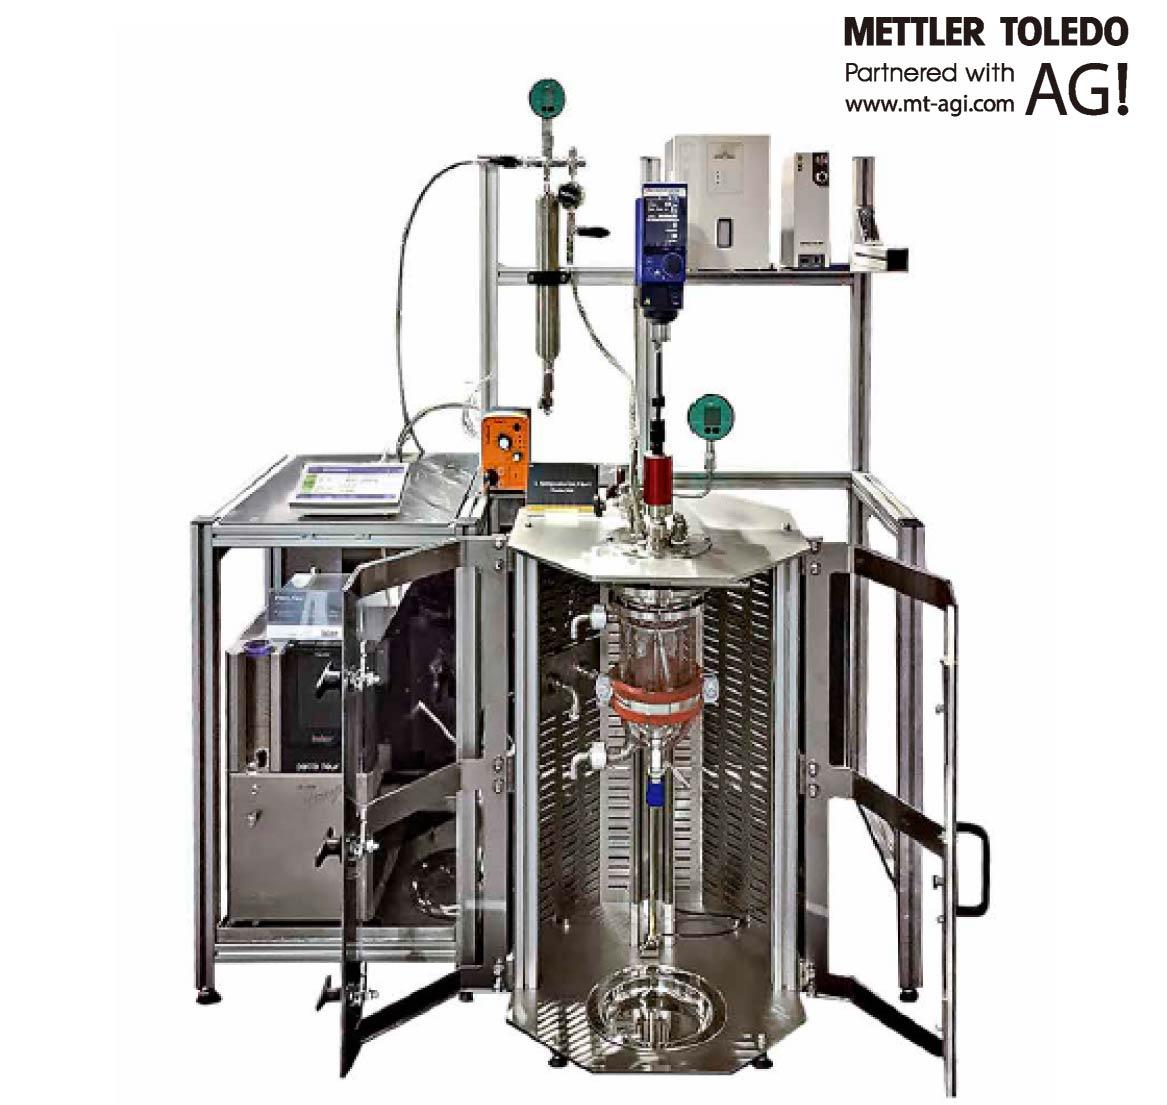 Pressure Reactor RX10